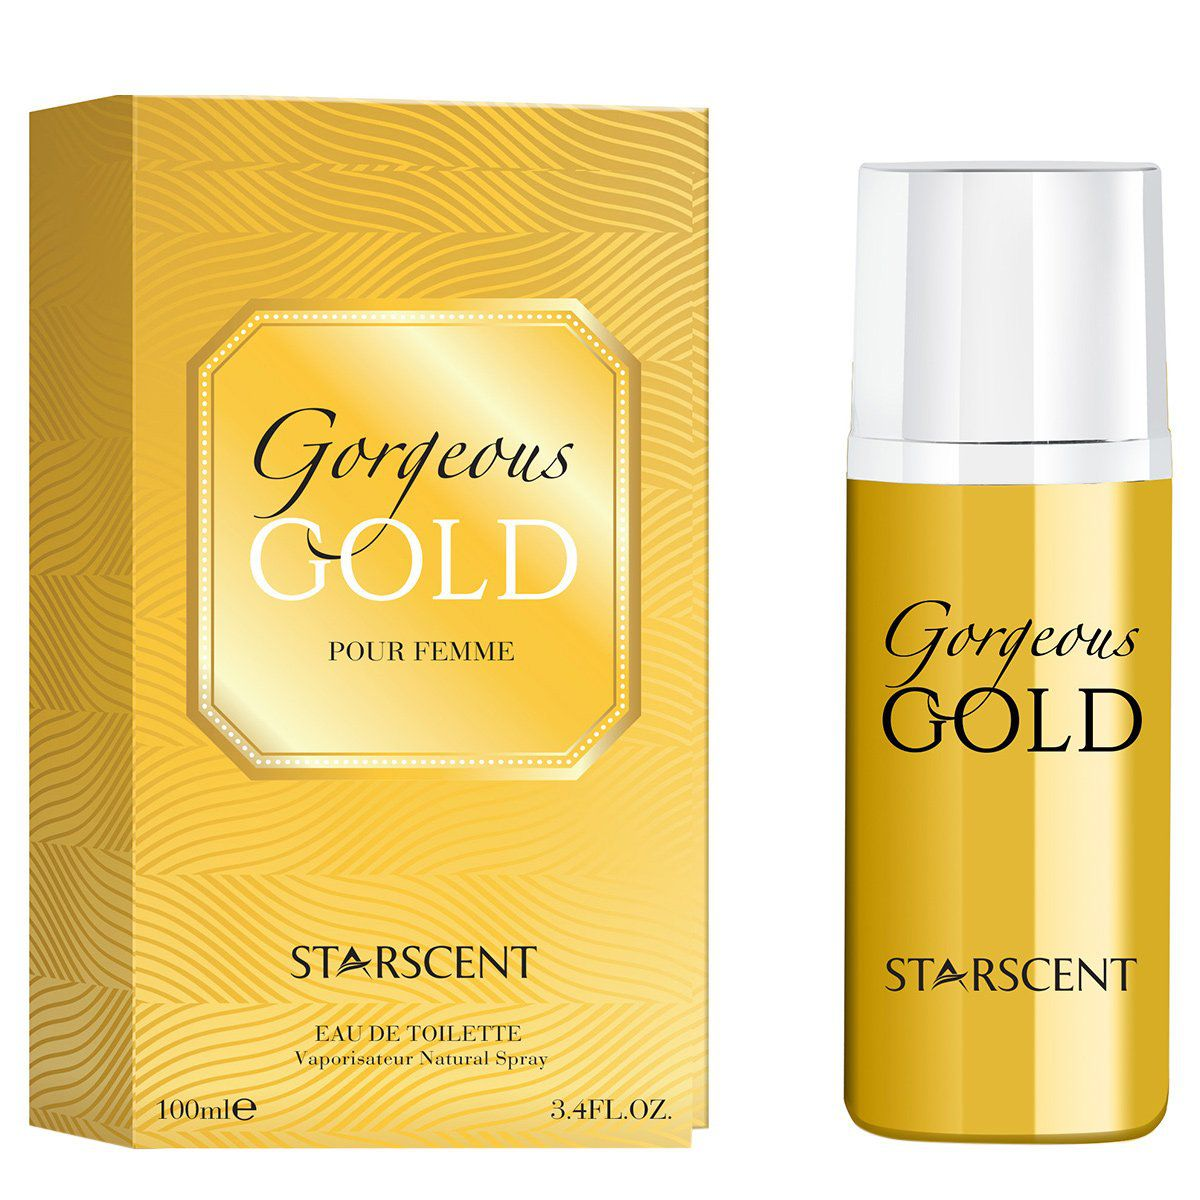 Gorgeous Gold Starscent  Feminino Eau de Parfum 100ml